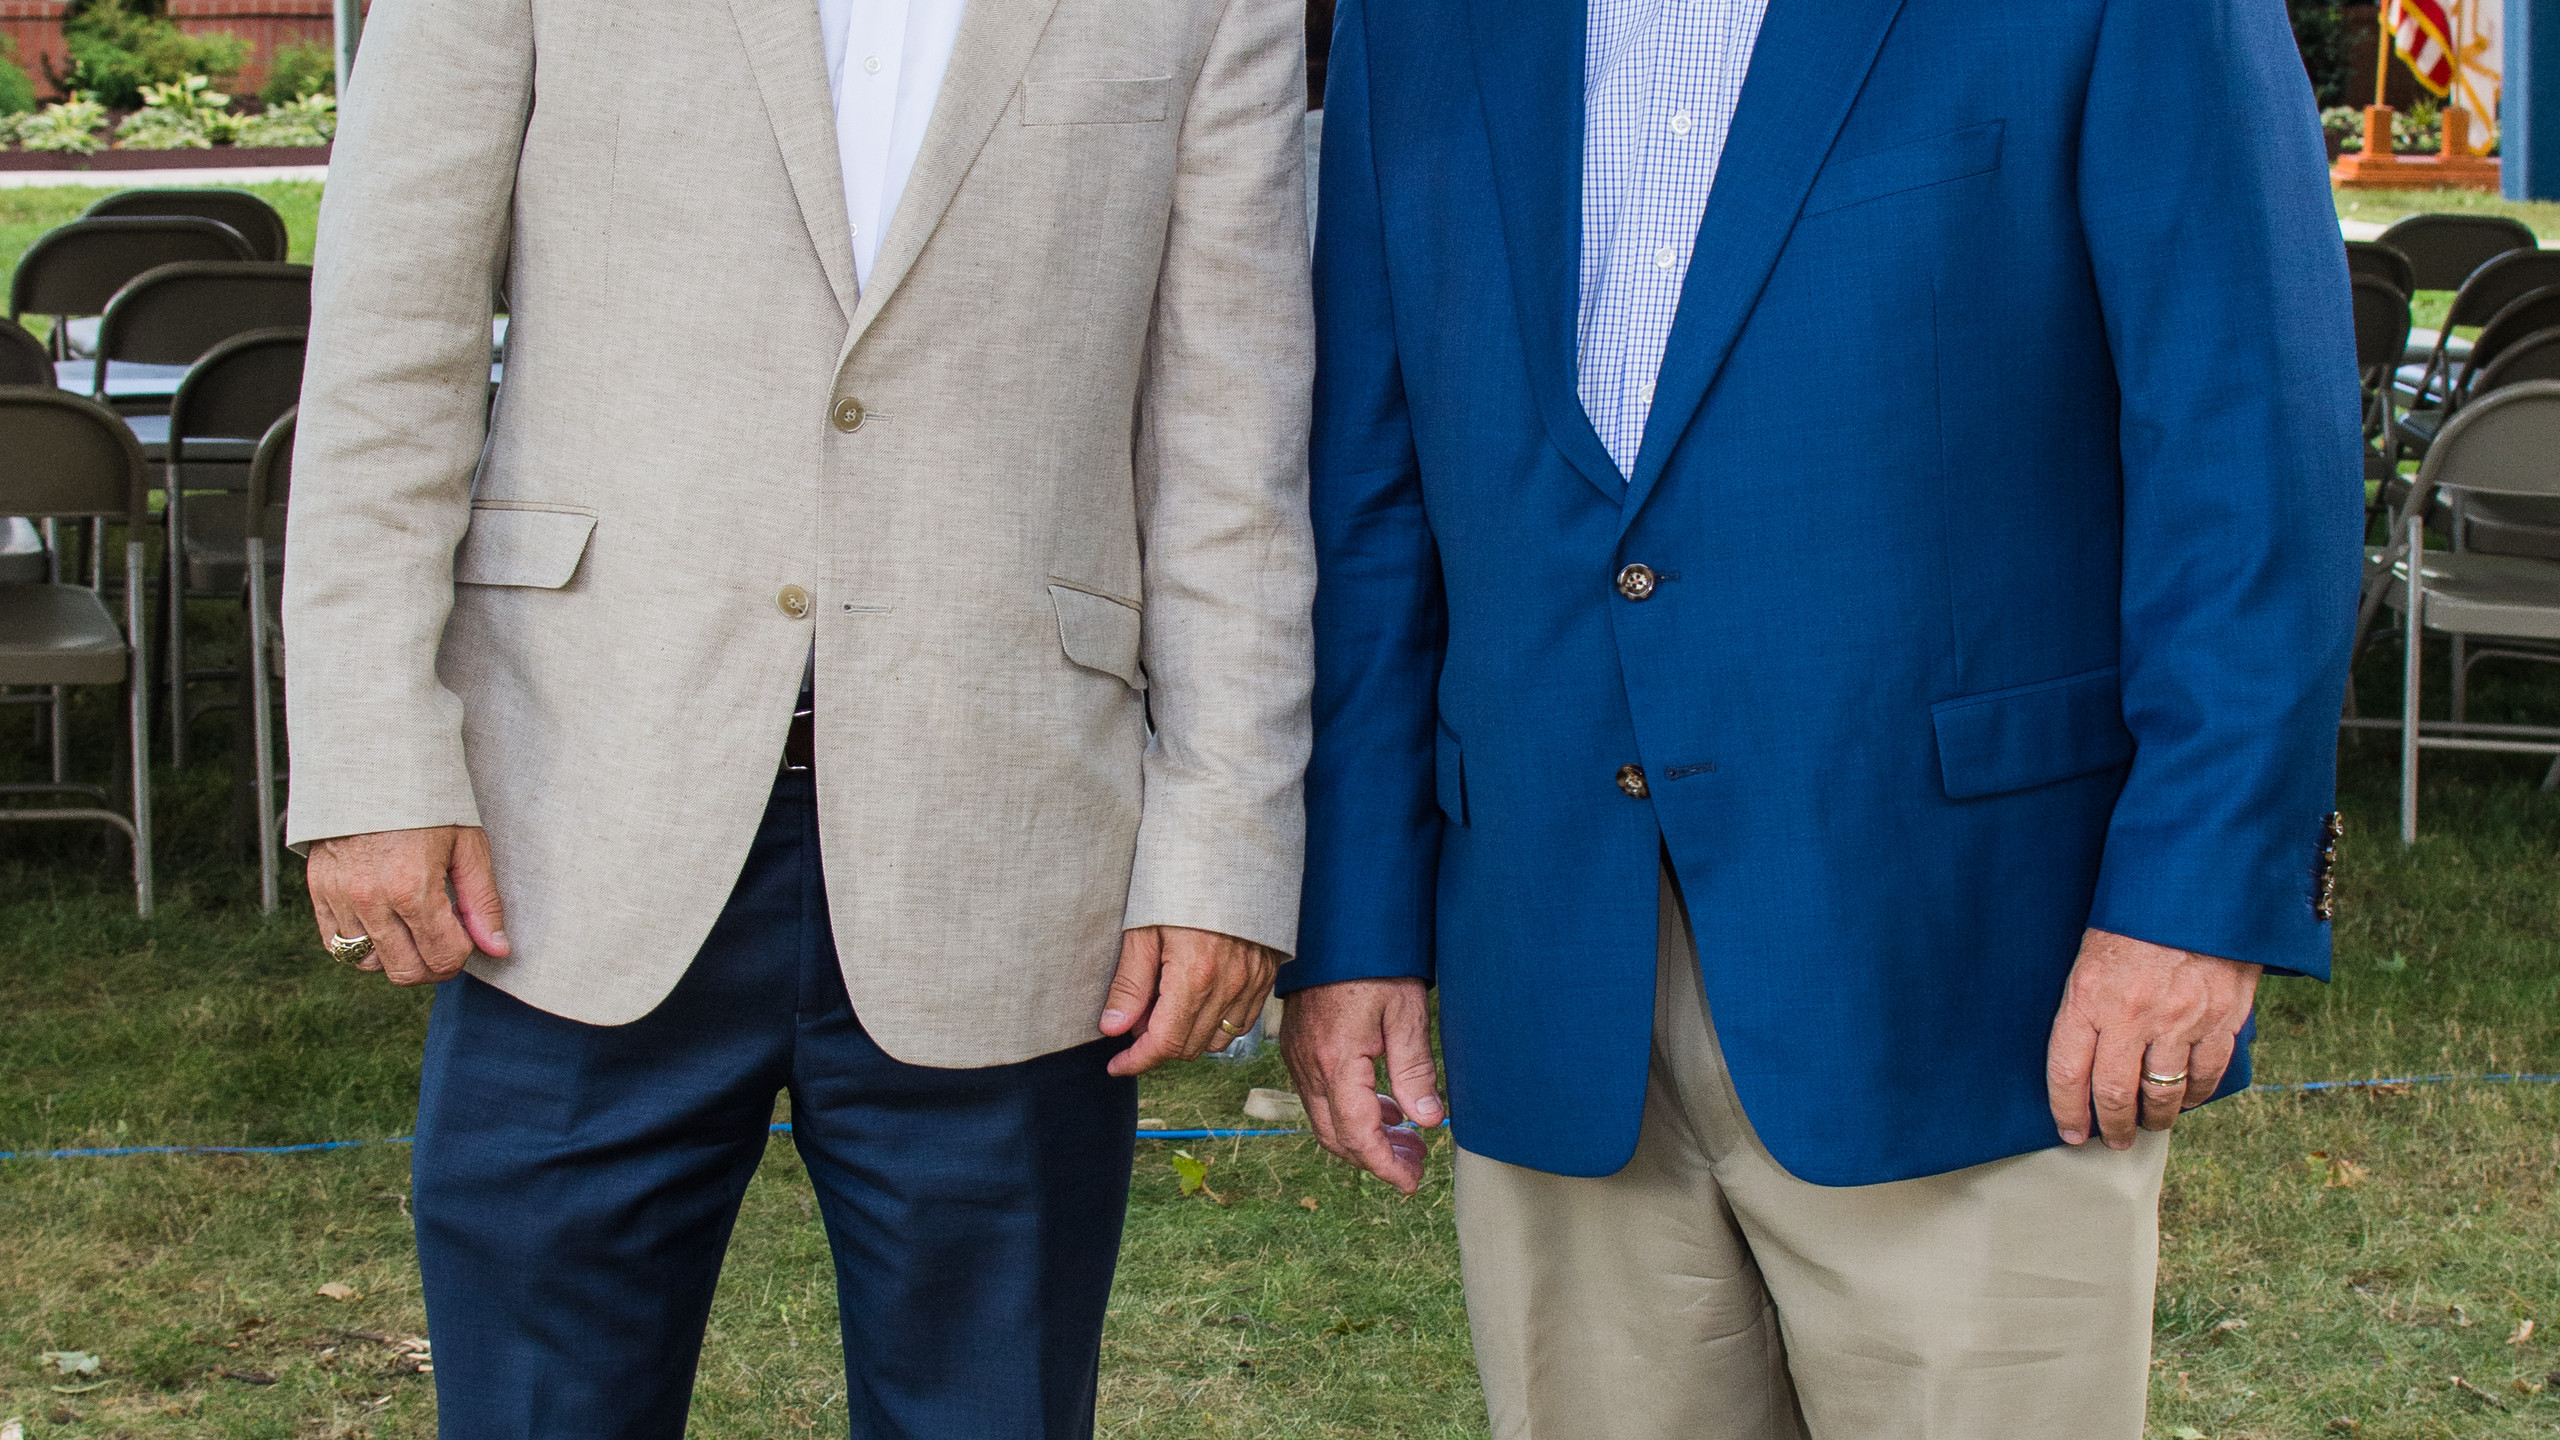 Charlie Koon and Sammy Stuard